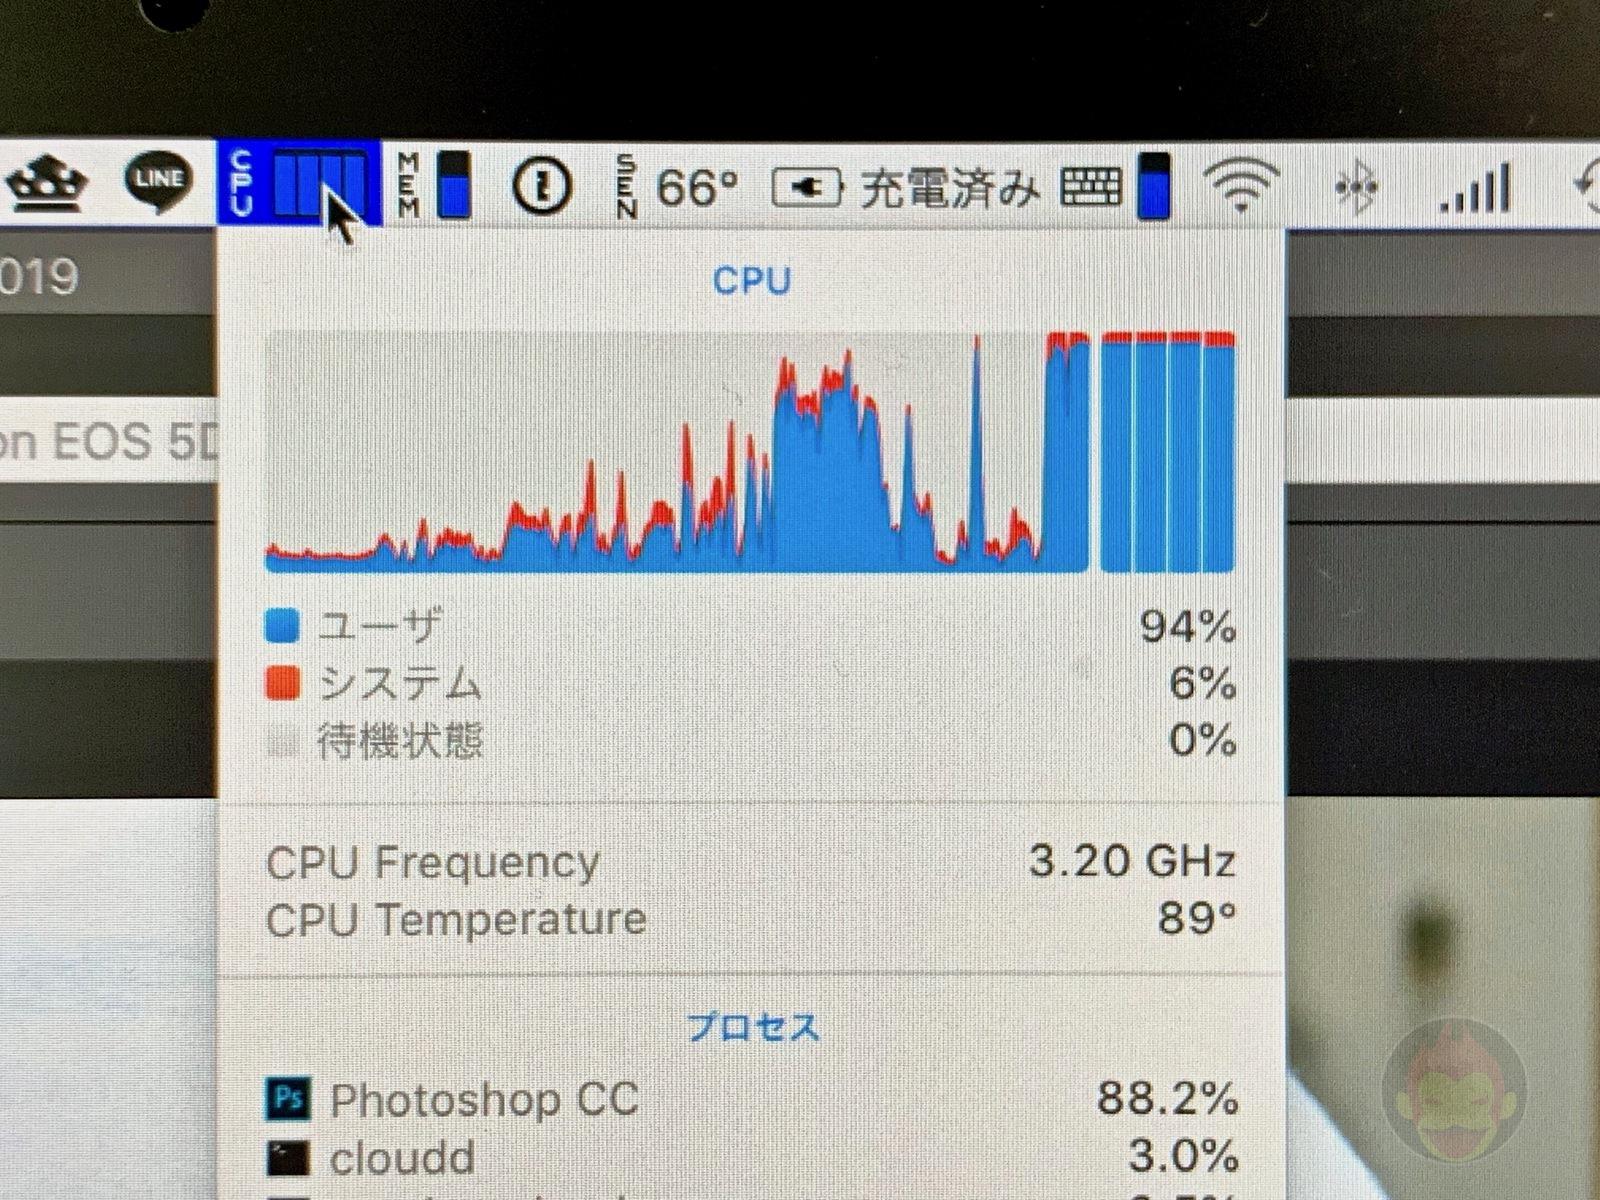 Editing Photos on MacBook Pro 13 02